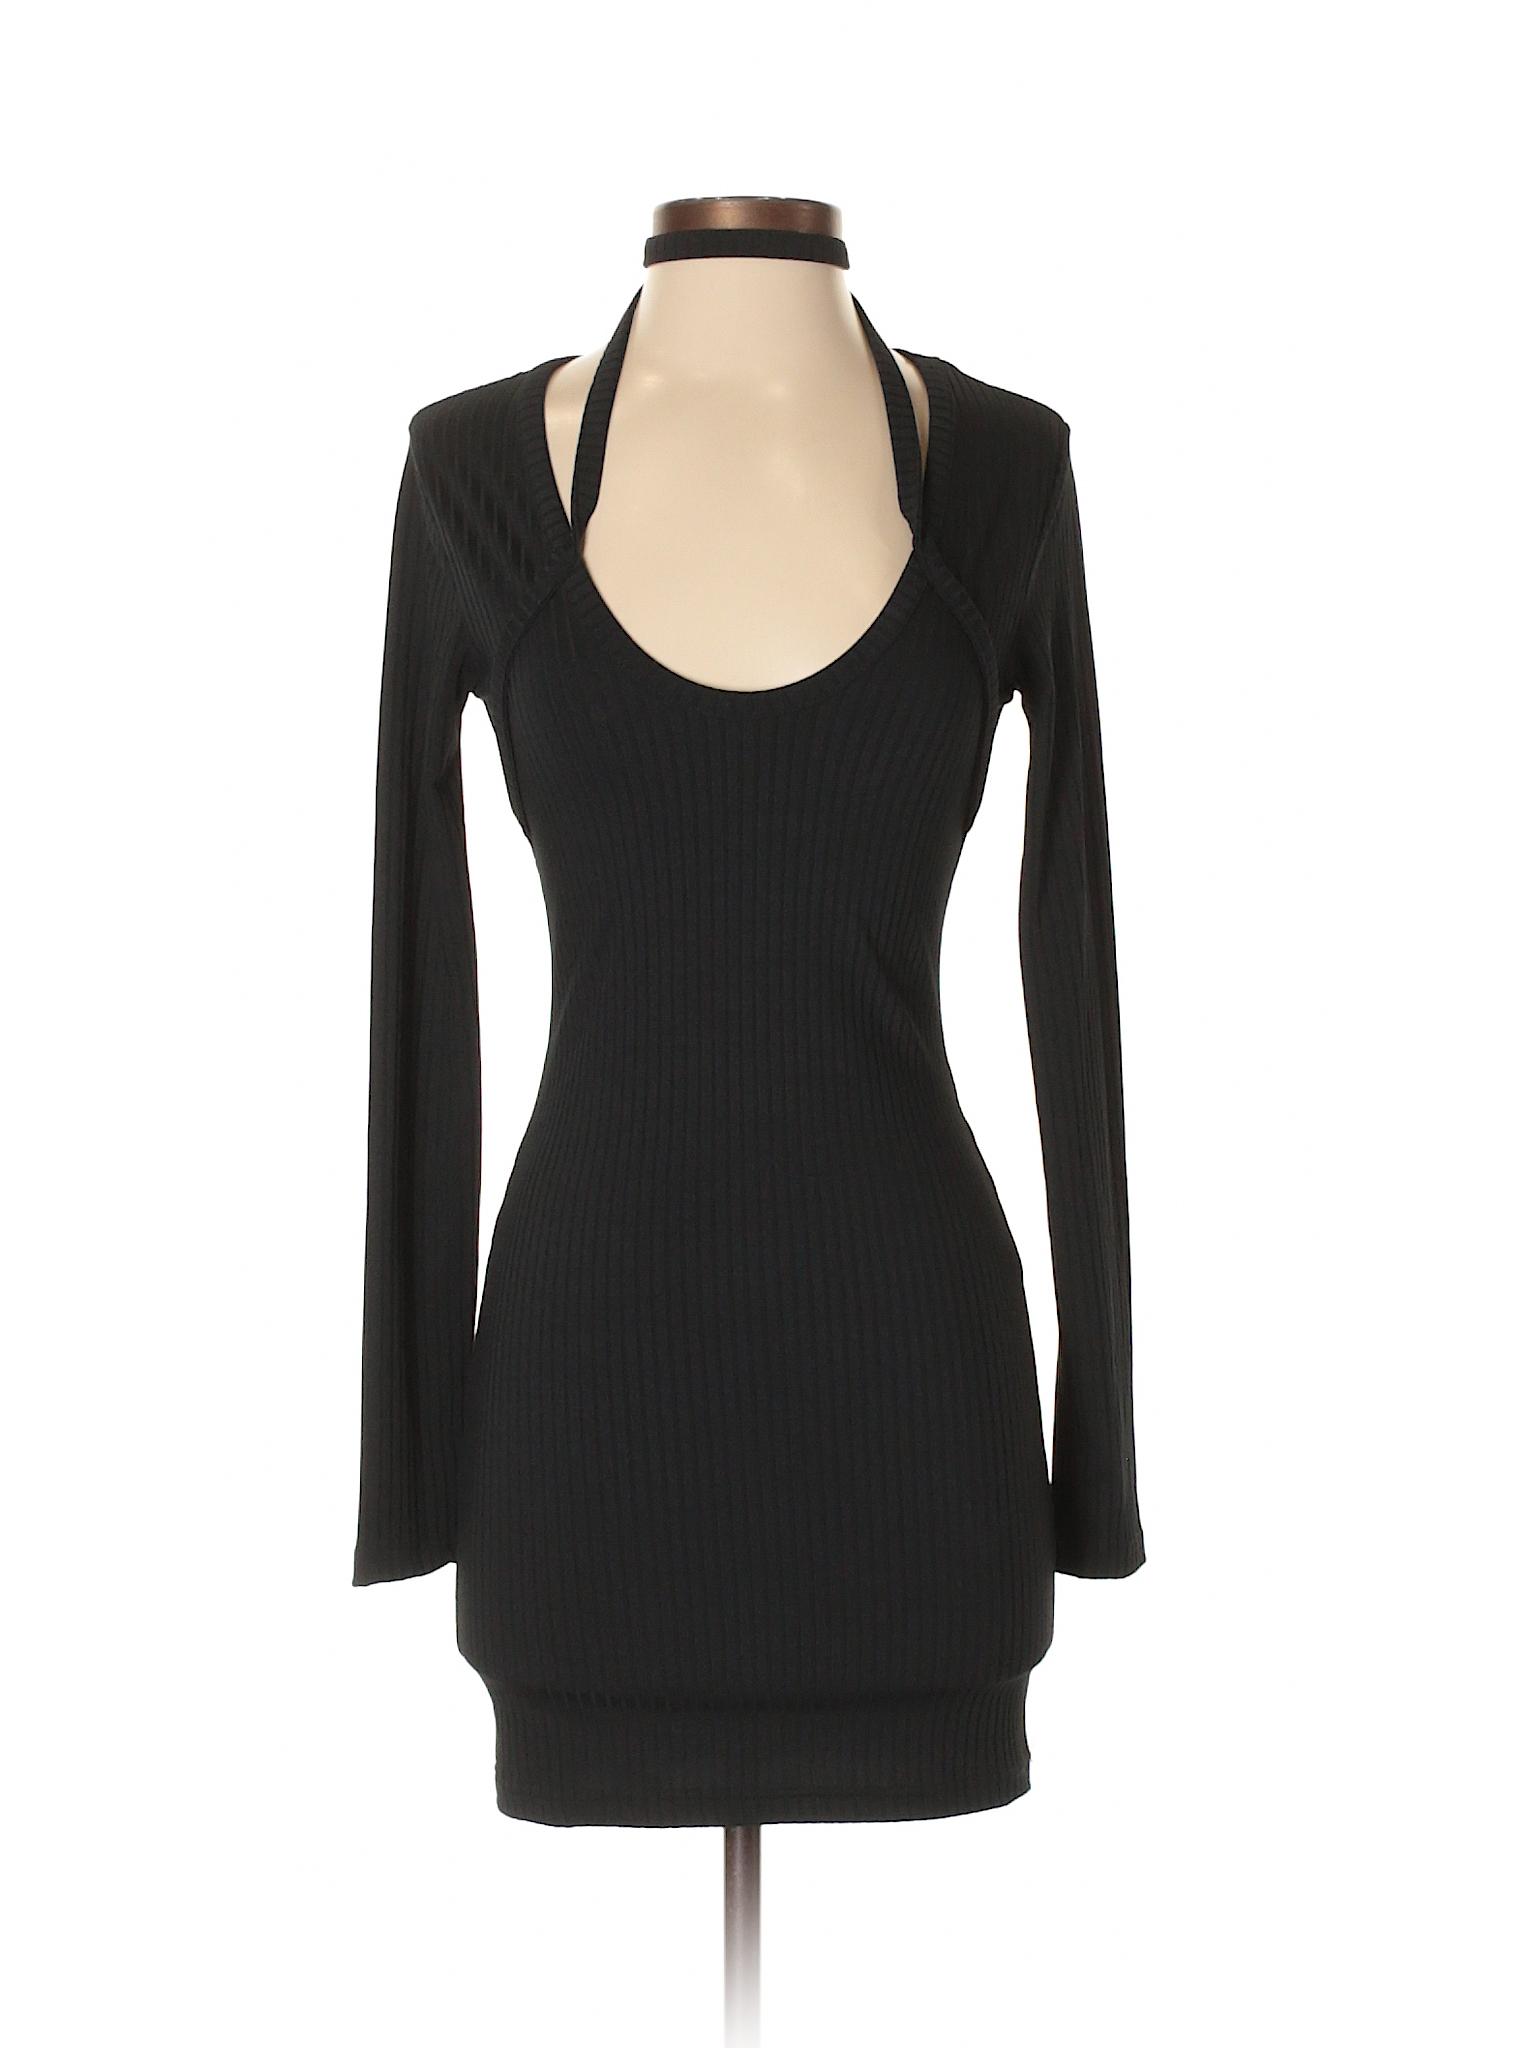 Inc Boutique Gal winter Dress Casual Nasty wvAg6qvT